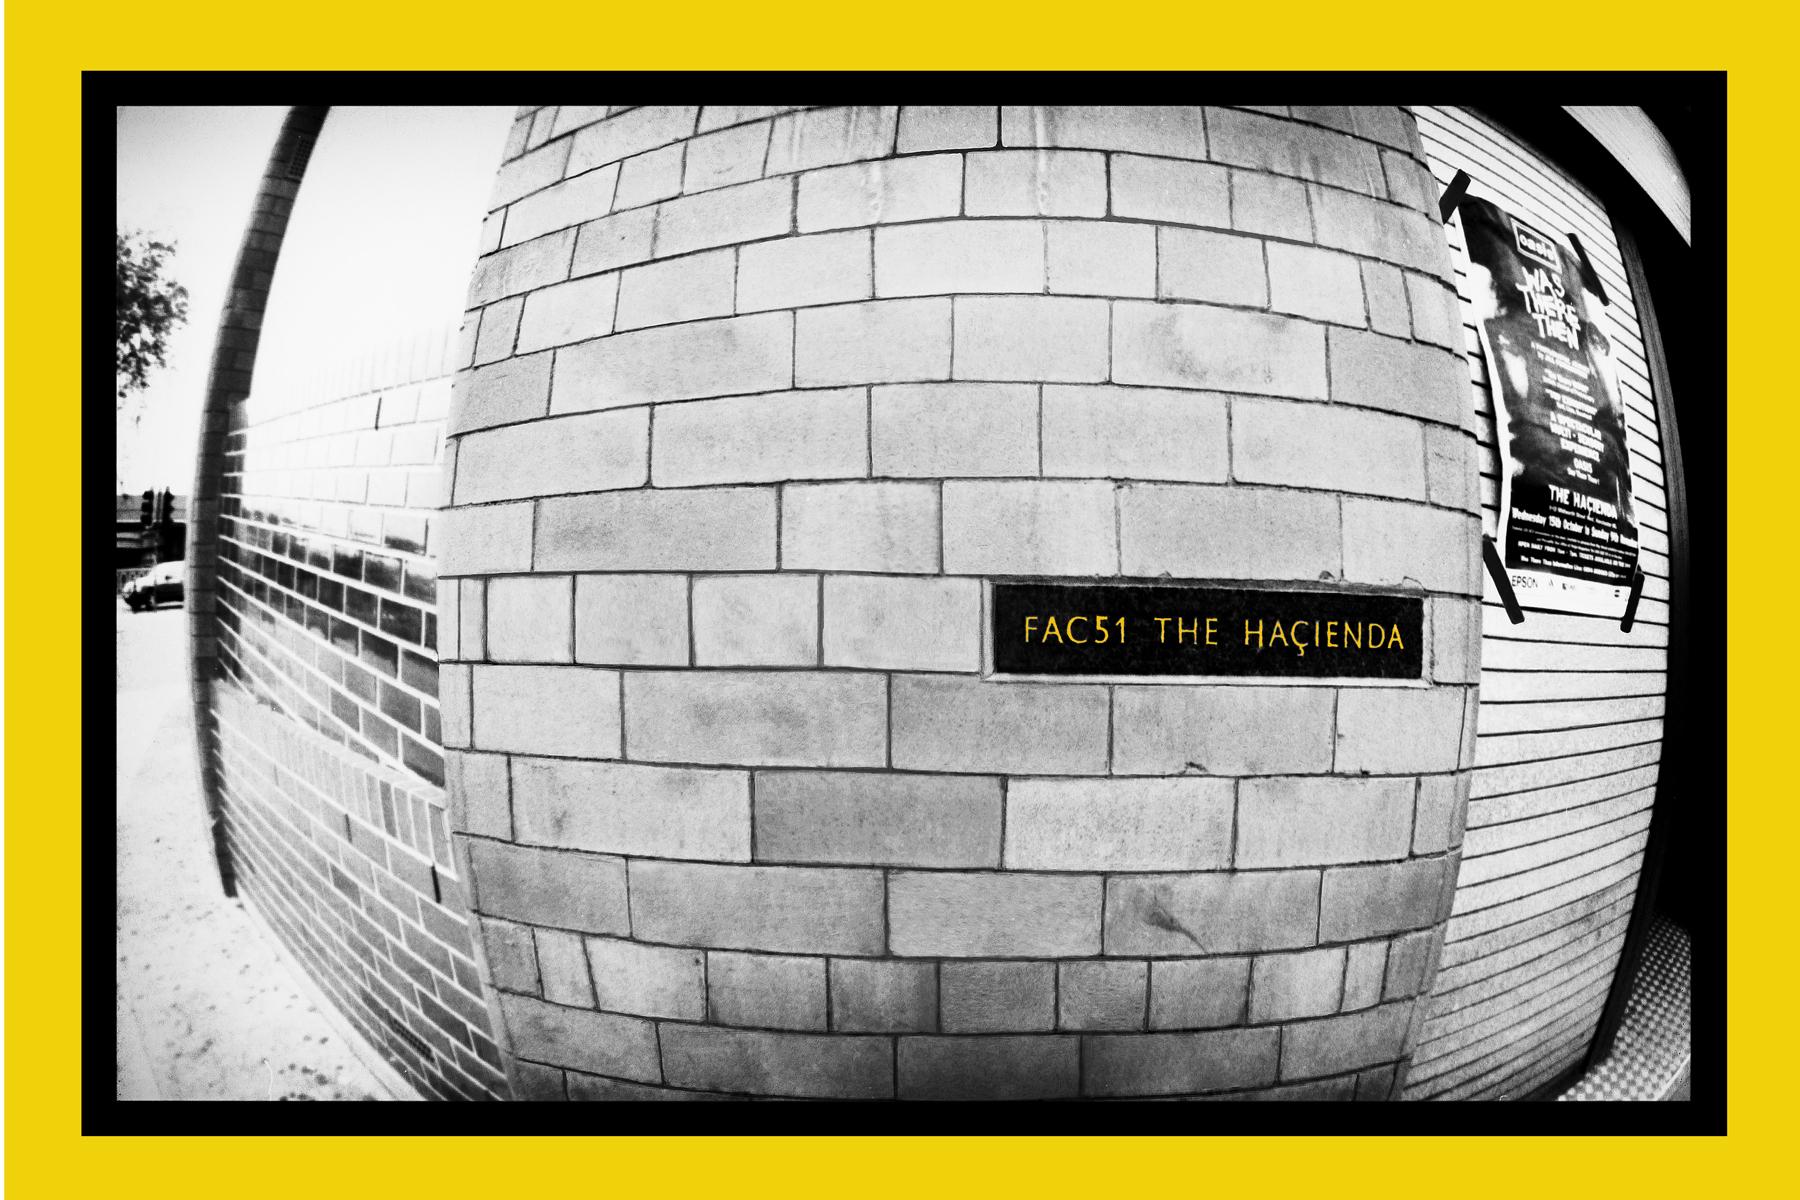 "Hacienda Club Original FAC51 Wall Manchester 16:x20"" £195.00.  20""x30"" £300.00  30""x40"" £495.00"